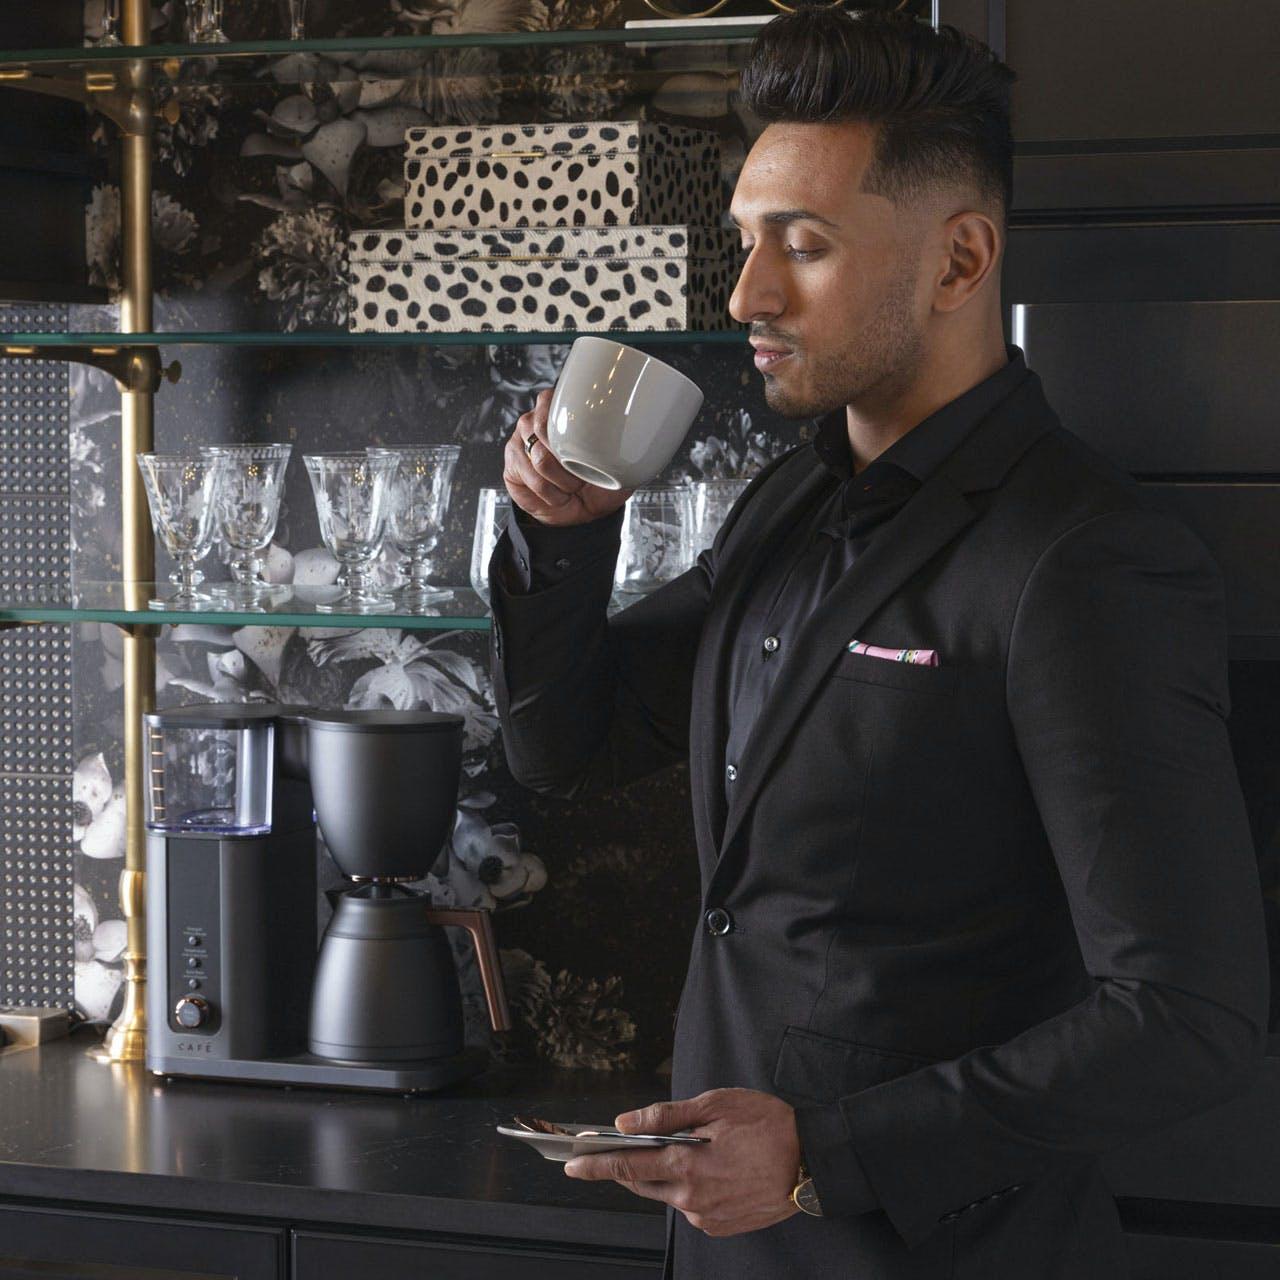 man drinking coffee in front of matte black coffee maker